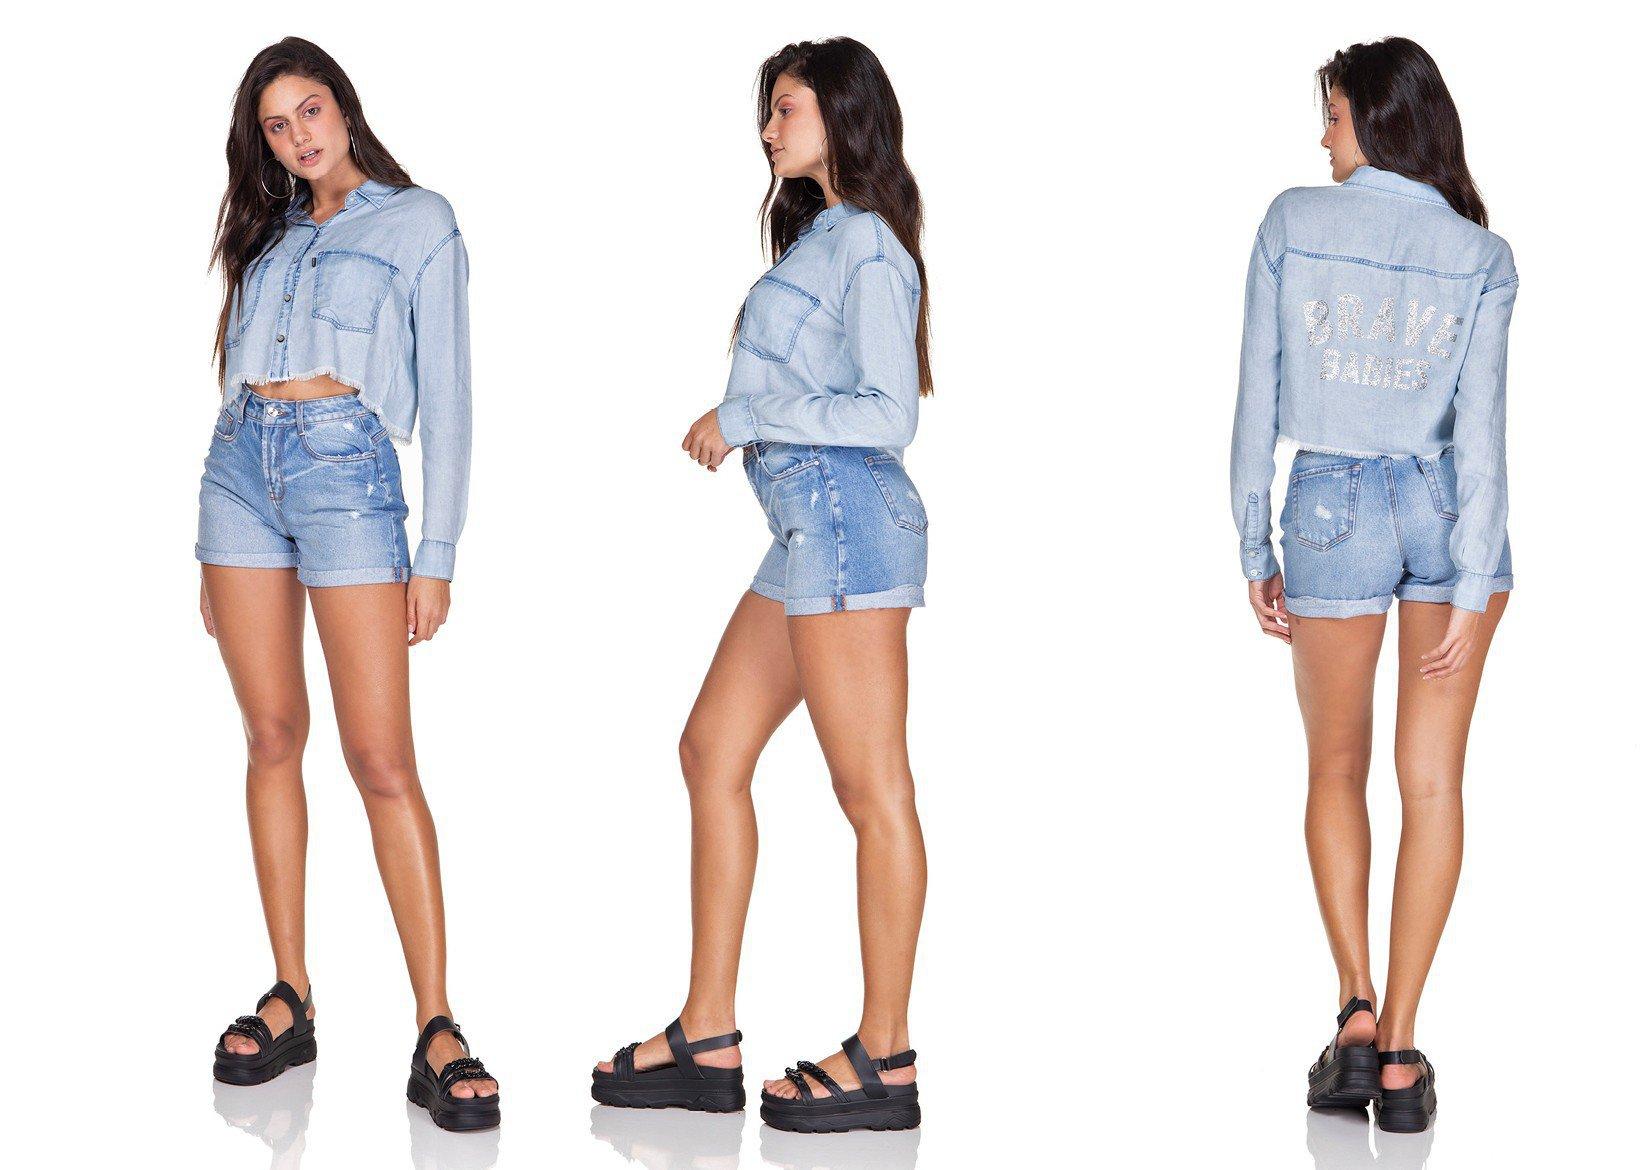 dz11143 camisa jeans cropped estampa nas costas denim zero trio